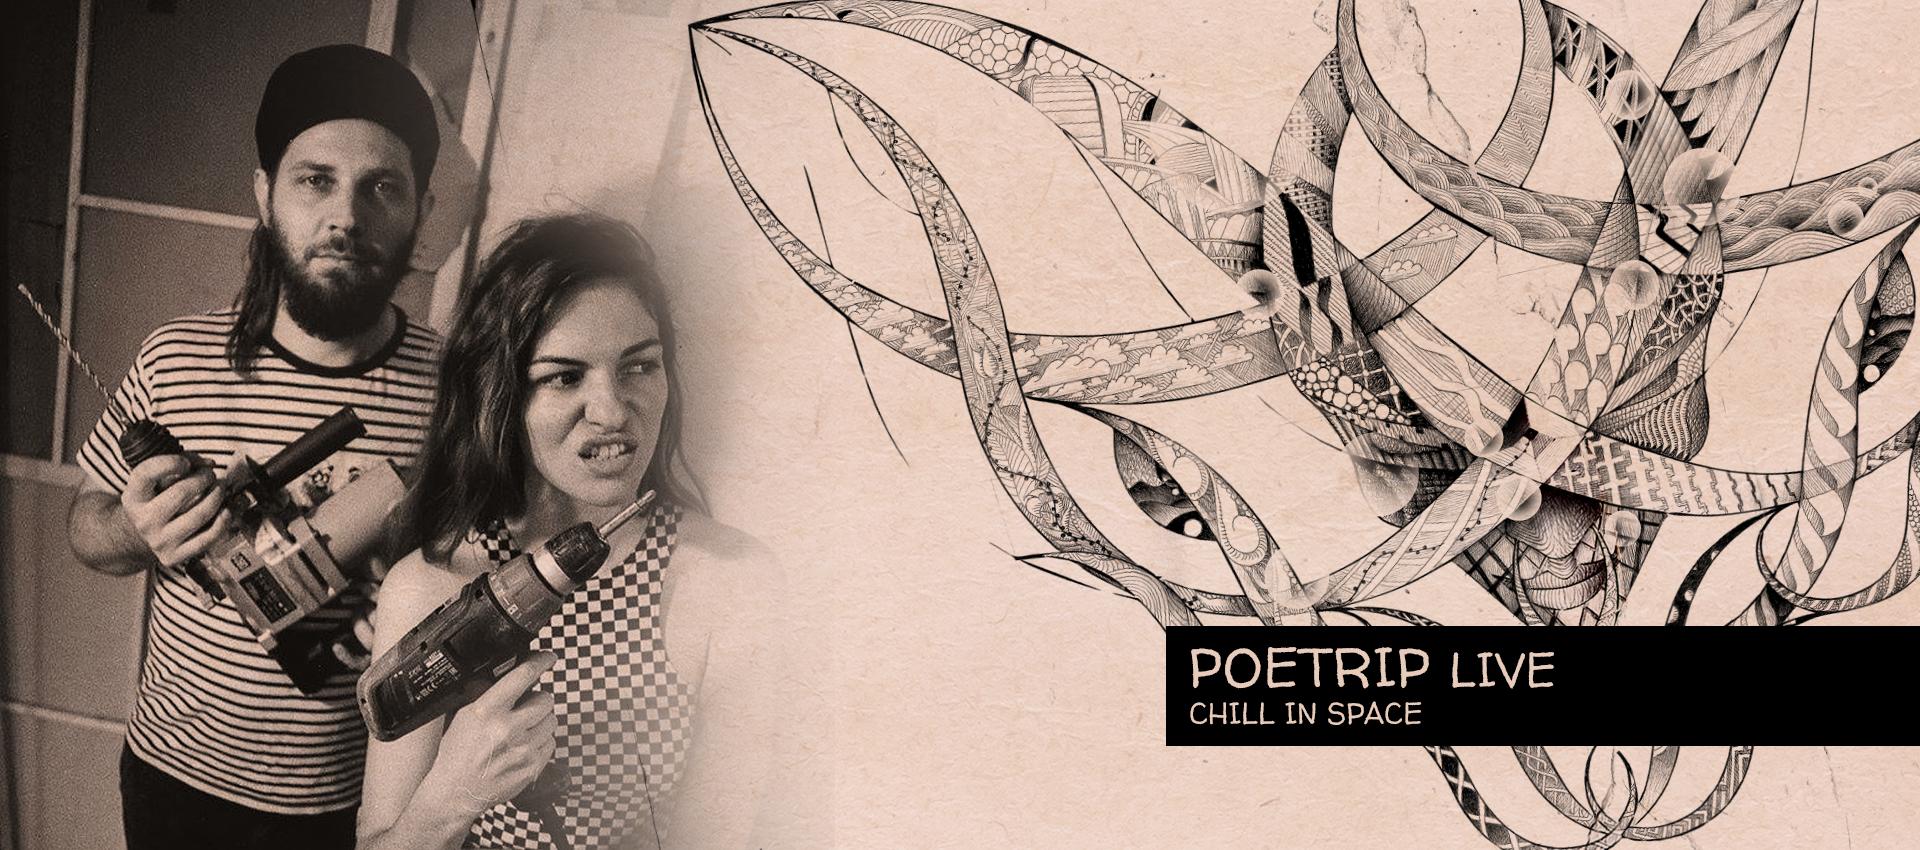 Poetrip Live